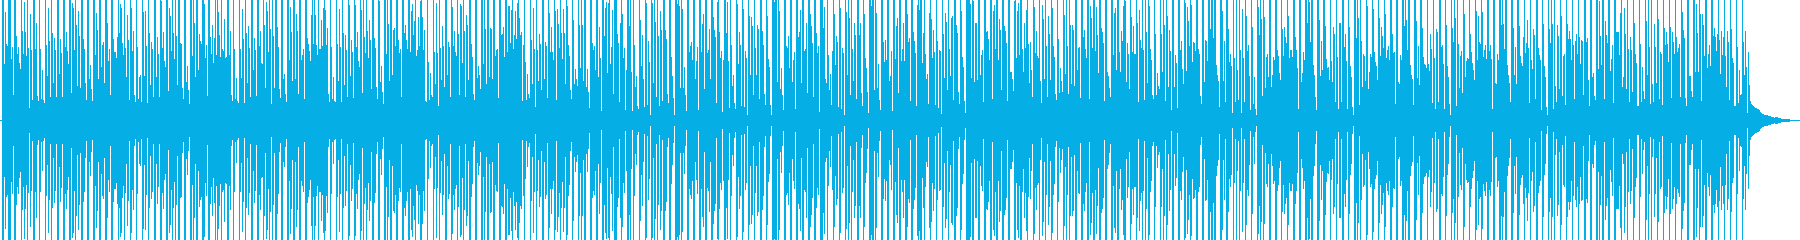 Laidback reggae t...'s reproduced waveform